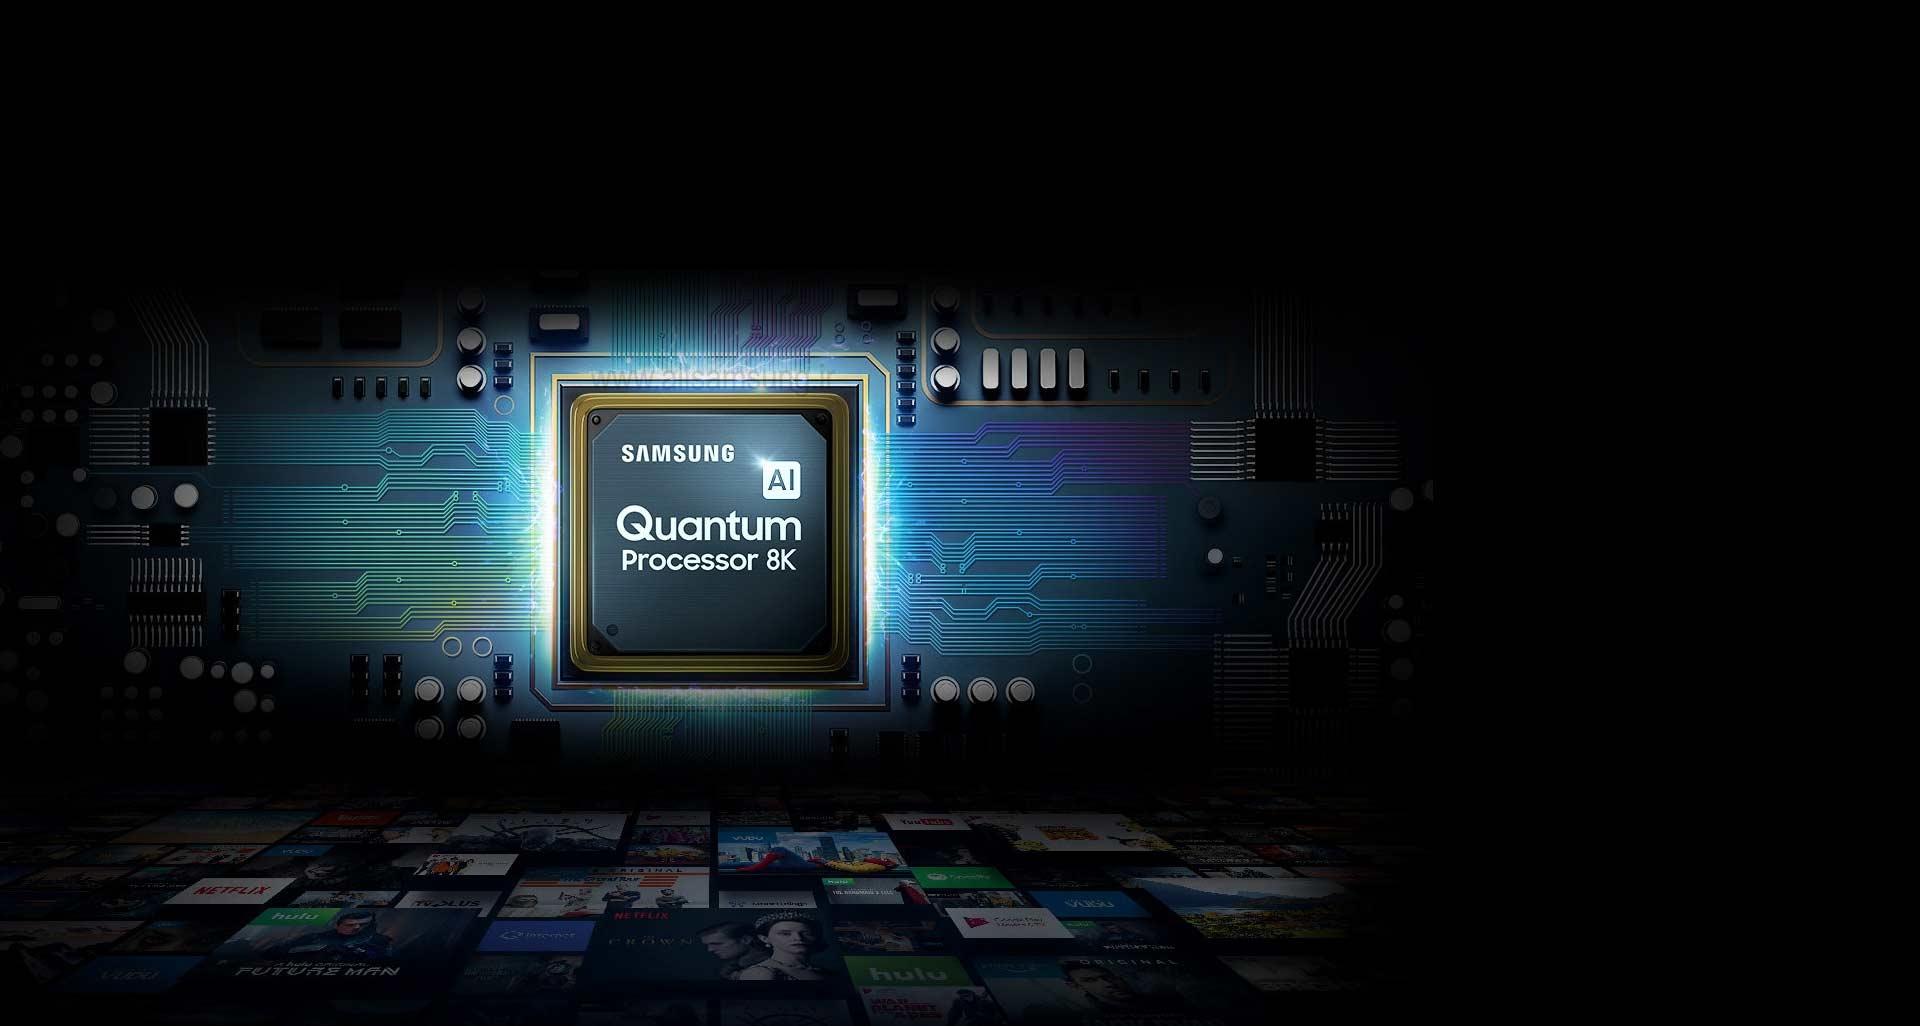 تلویزیون QLED 8K، تعریفی دیگر از هوشمندی